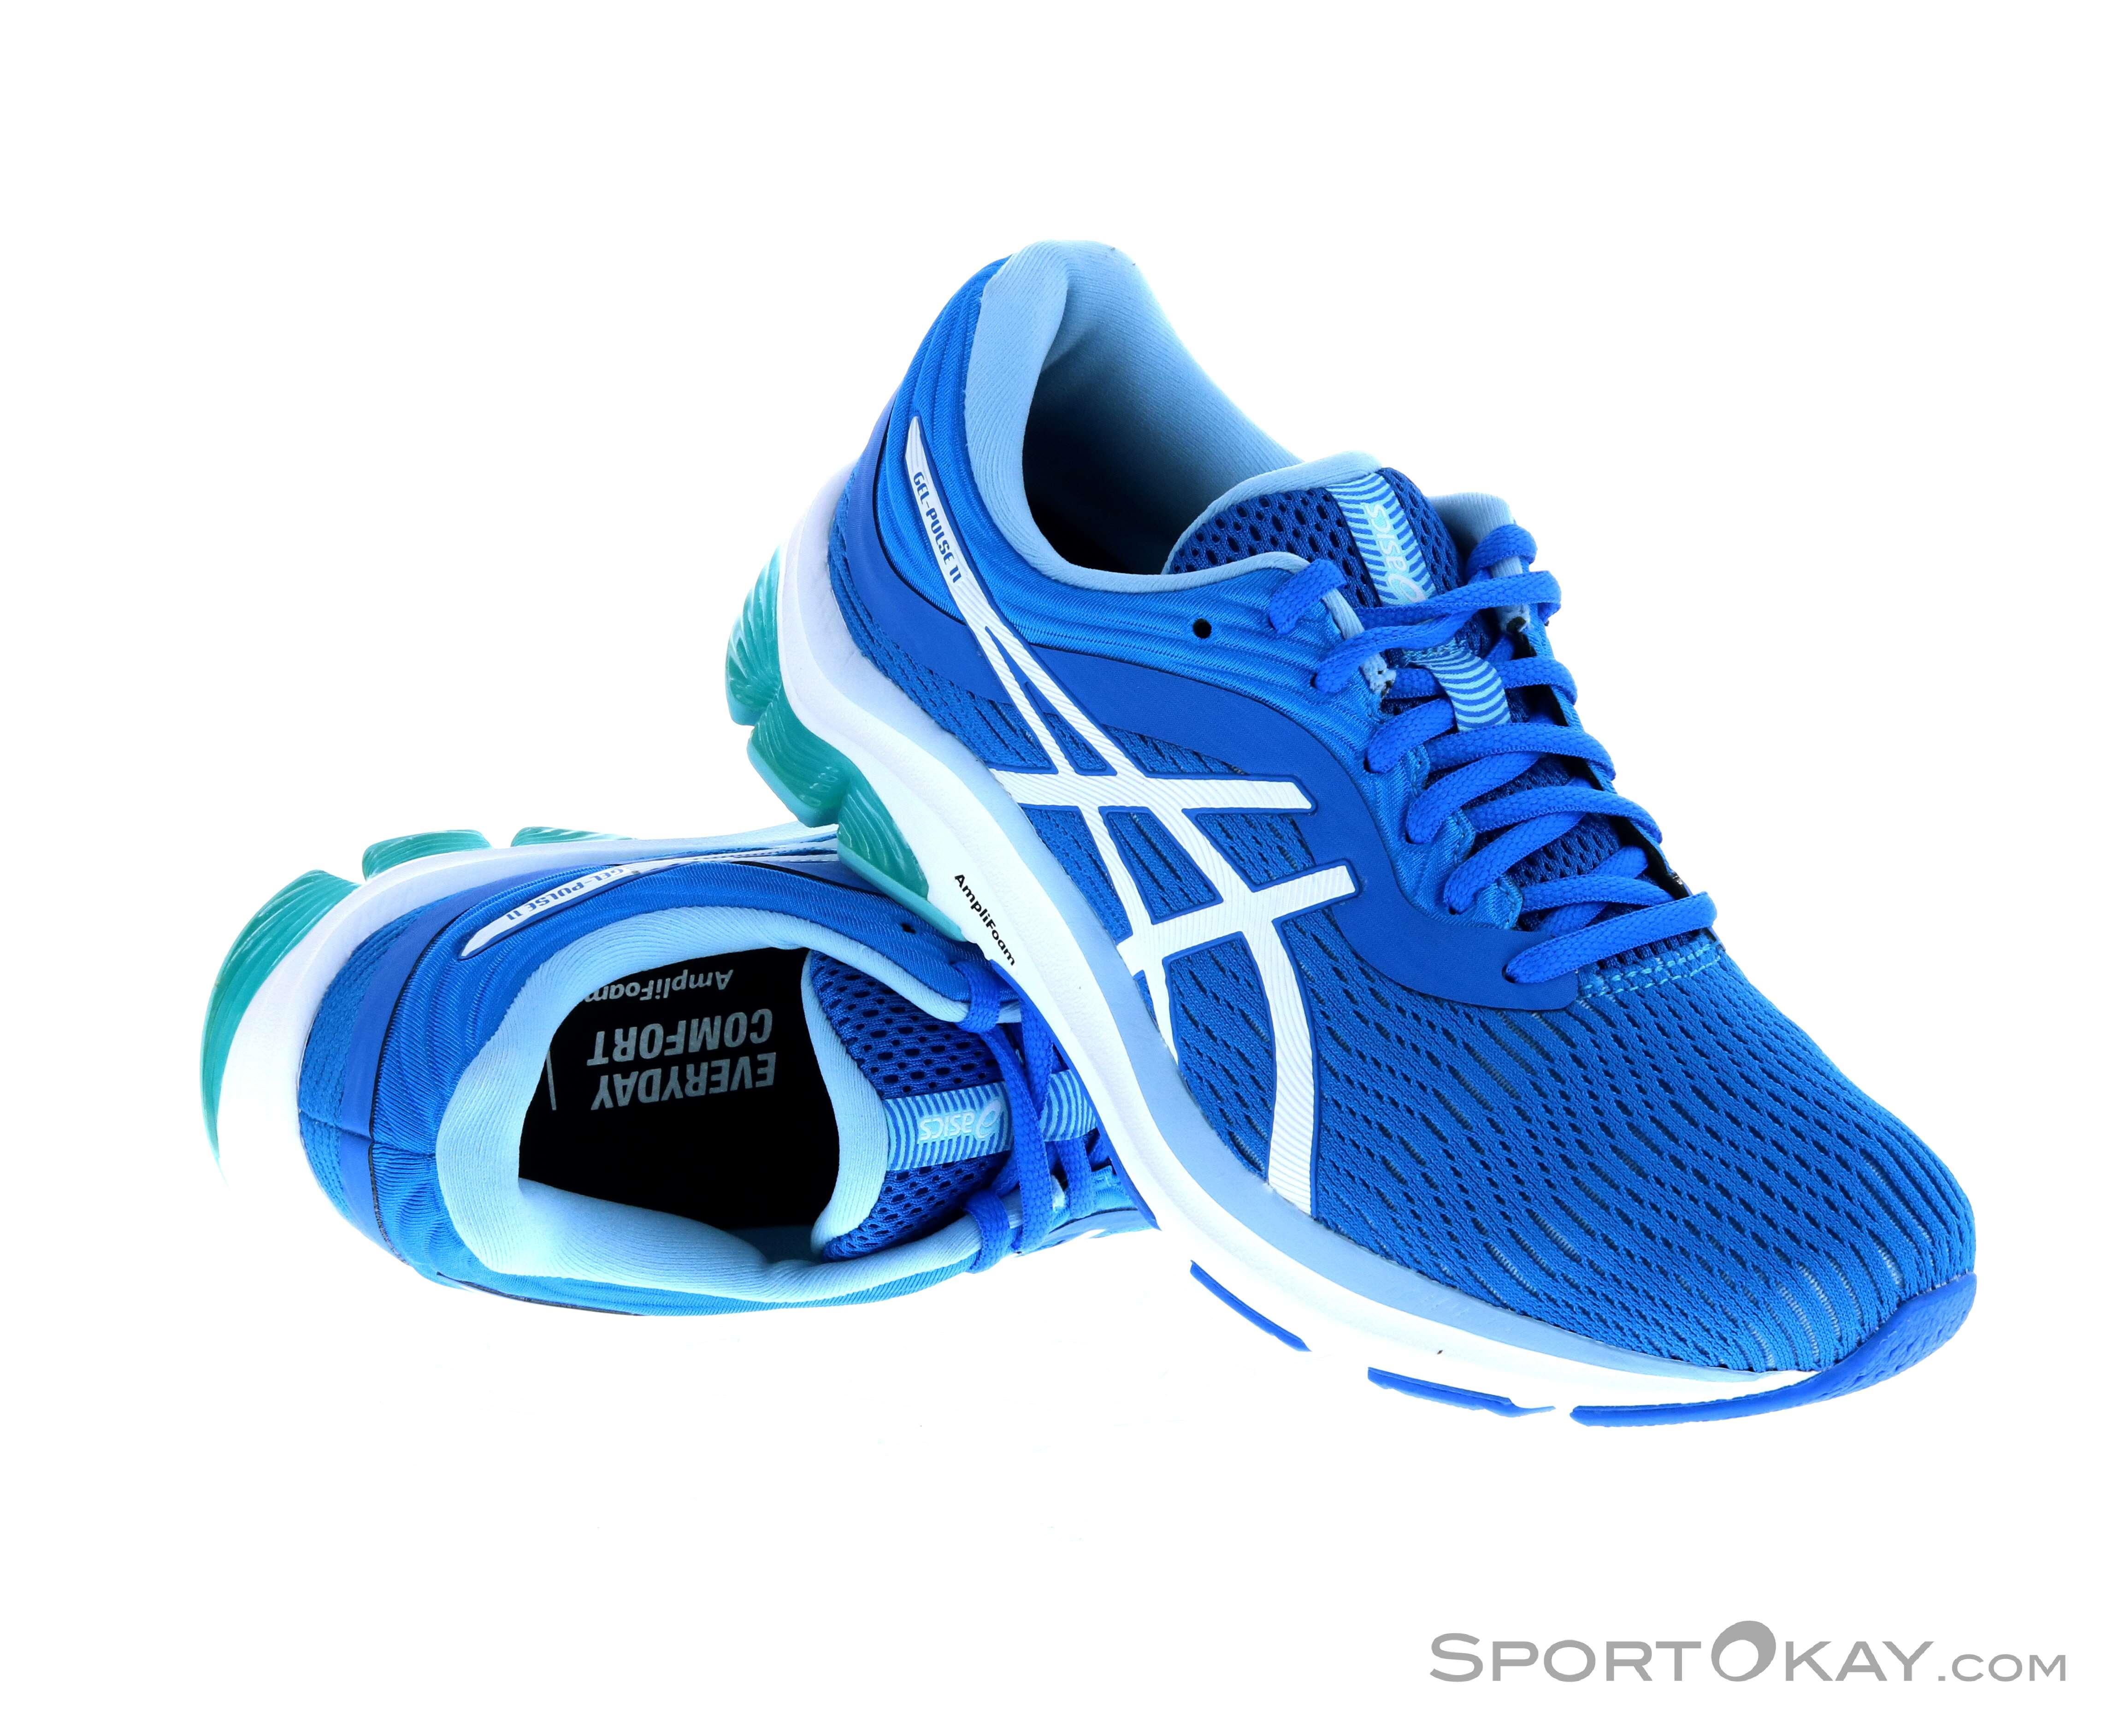 Asics Asics Gel Pulse 11 Womens Running Shoes